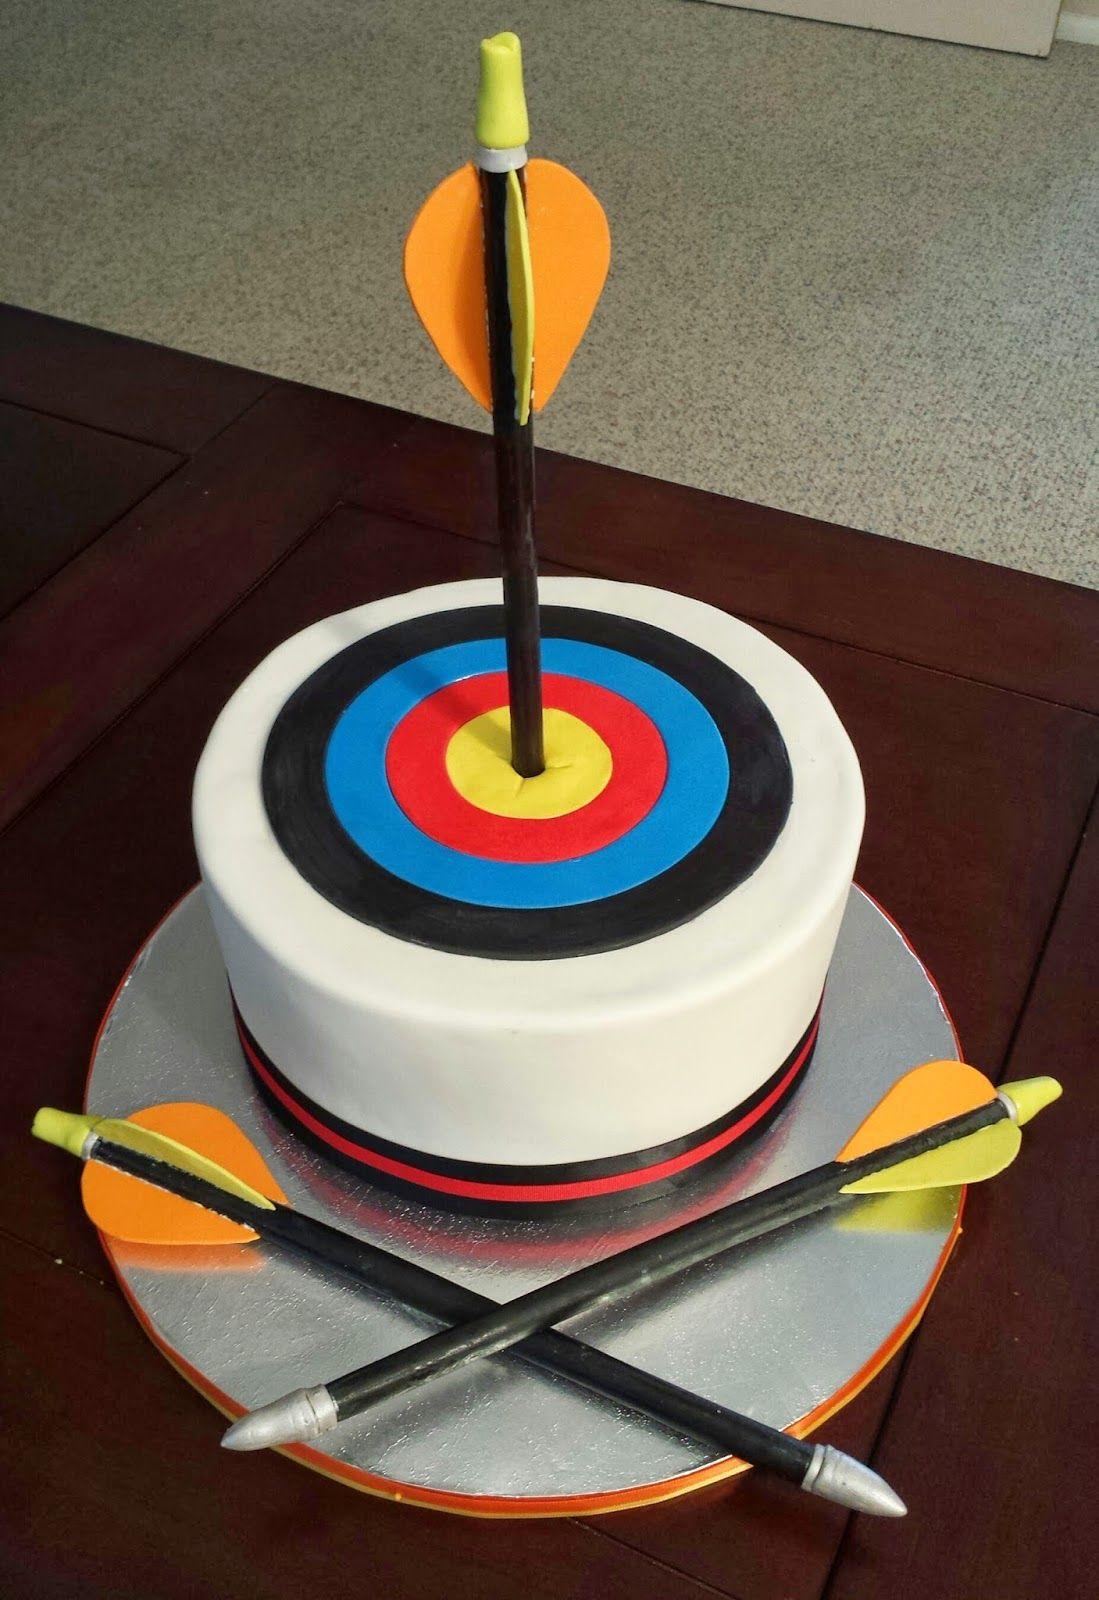 Cake Decorating Kit Target : J s Cakes: Archery Target and Arrows Birthday Cake Kids  Birthday Cakes I Made Pinterest ...